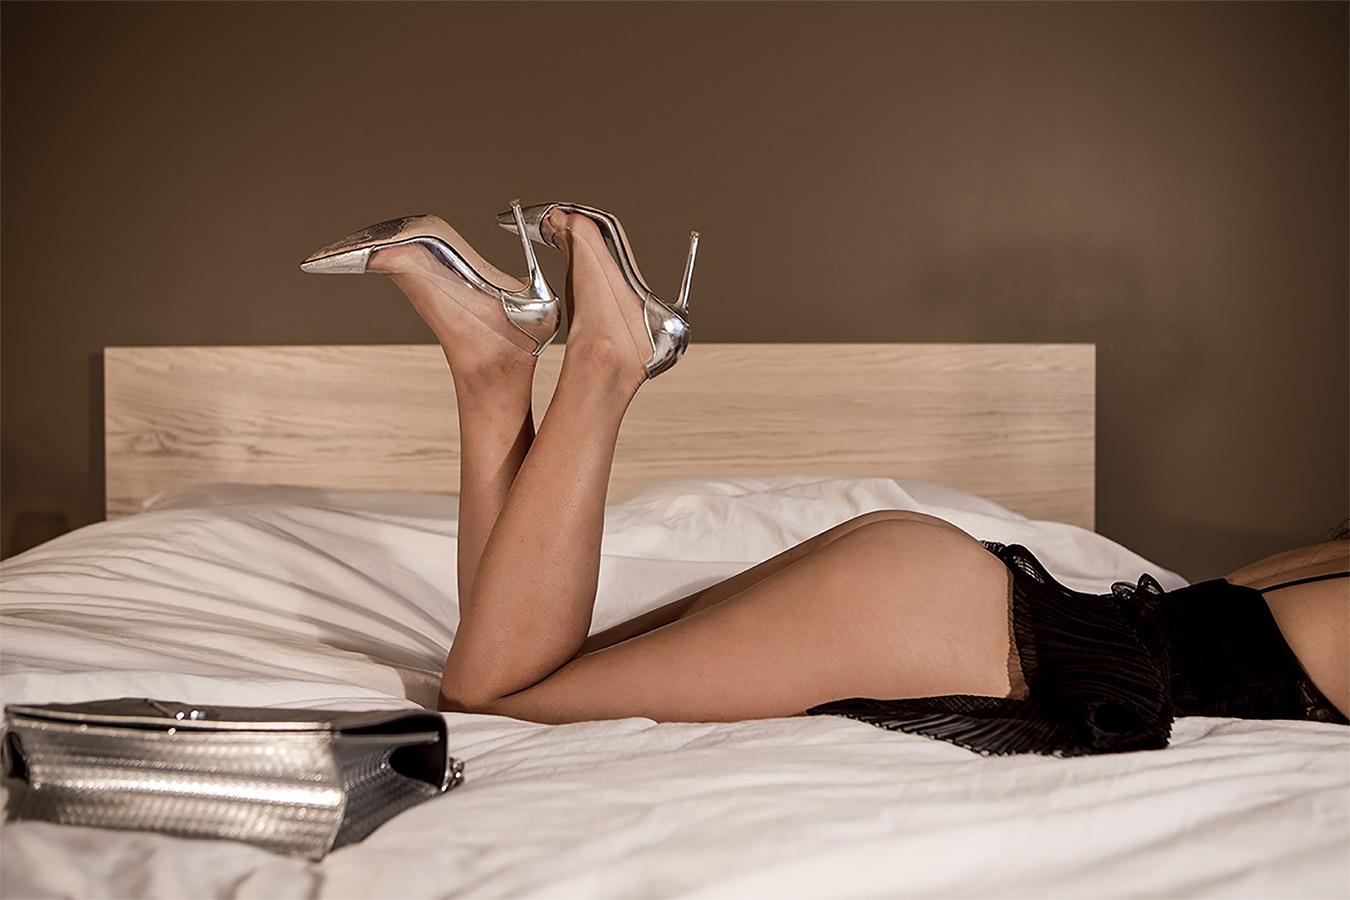 Amber_Shi_erotic_photography_Silver_dior_heels_purse_legs_sexy